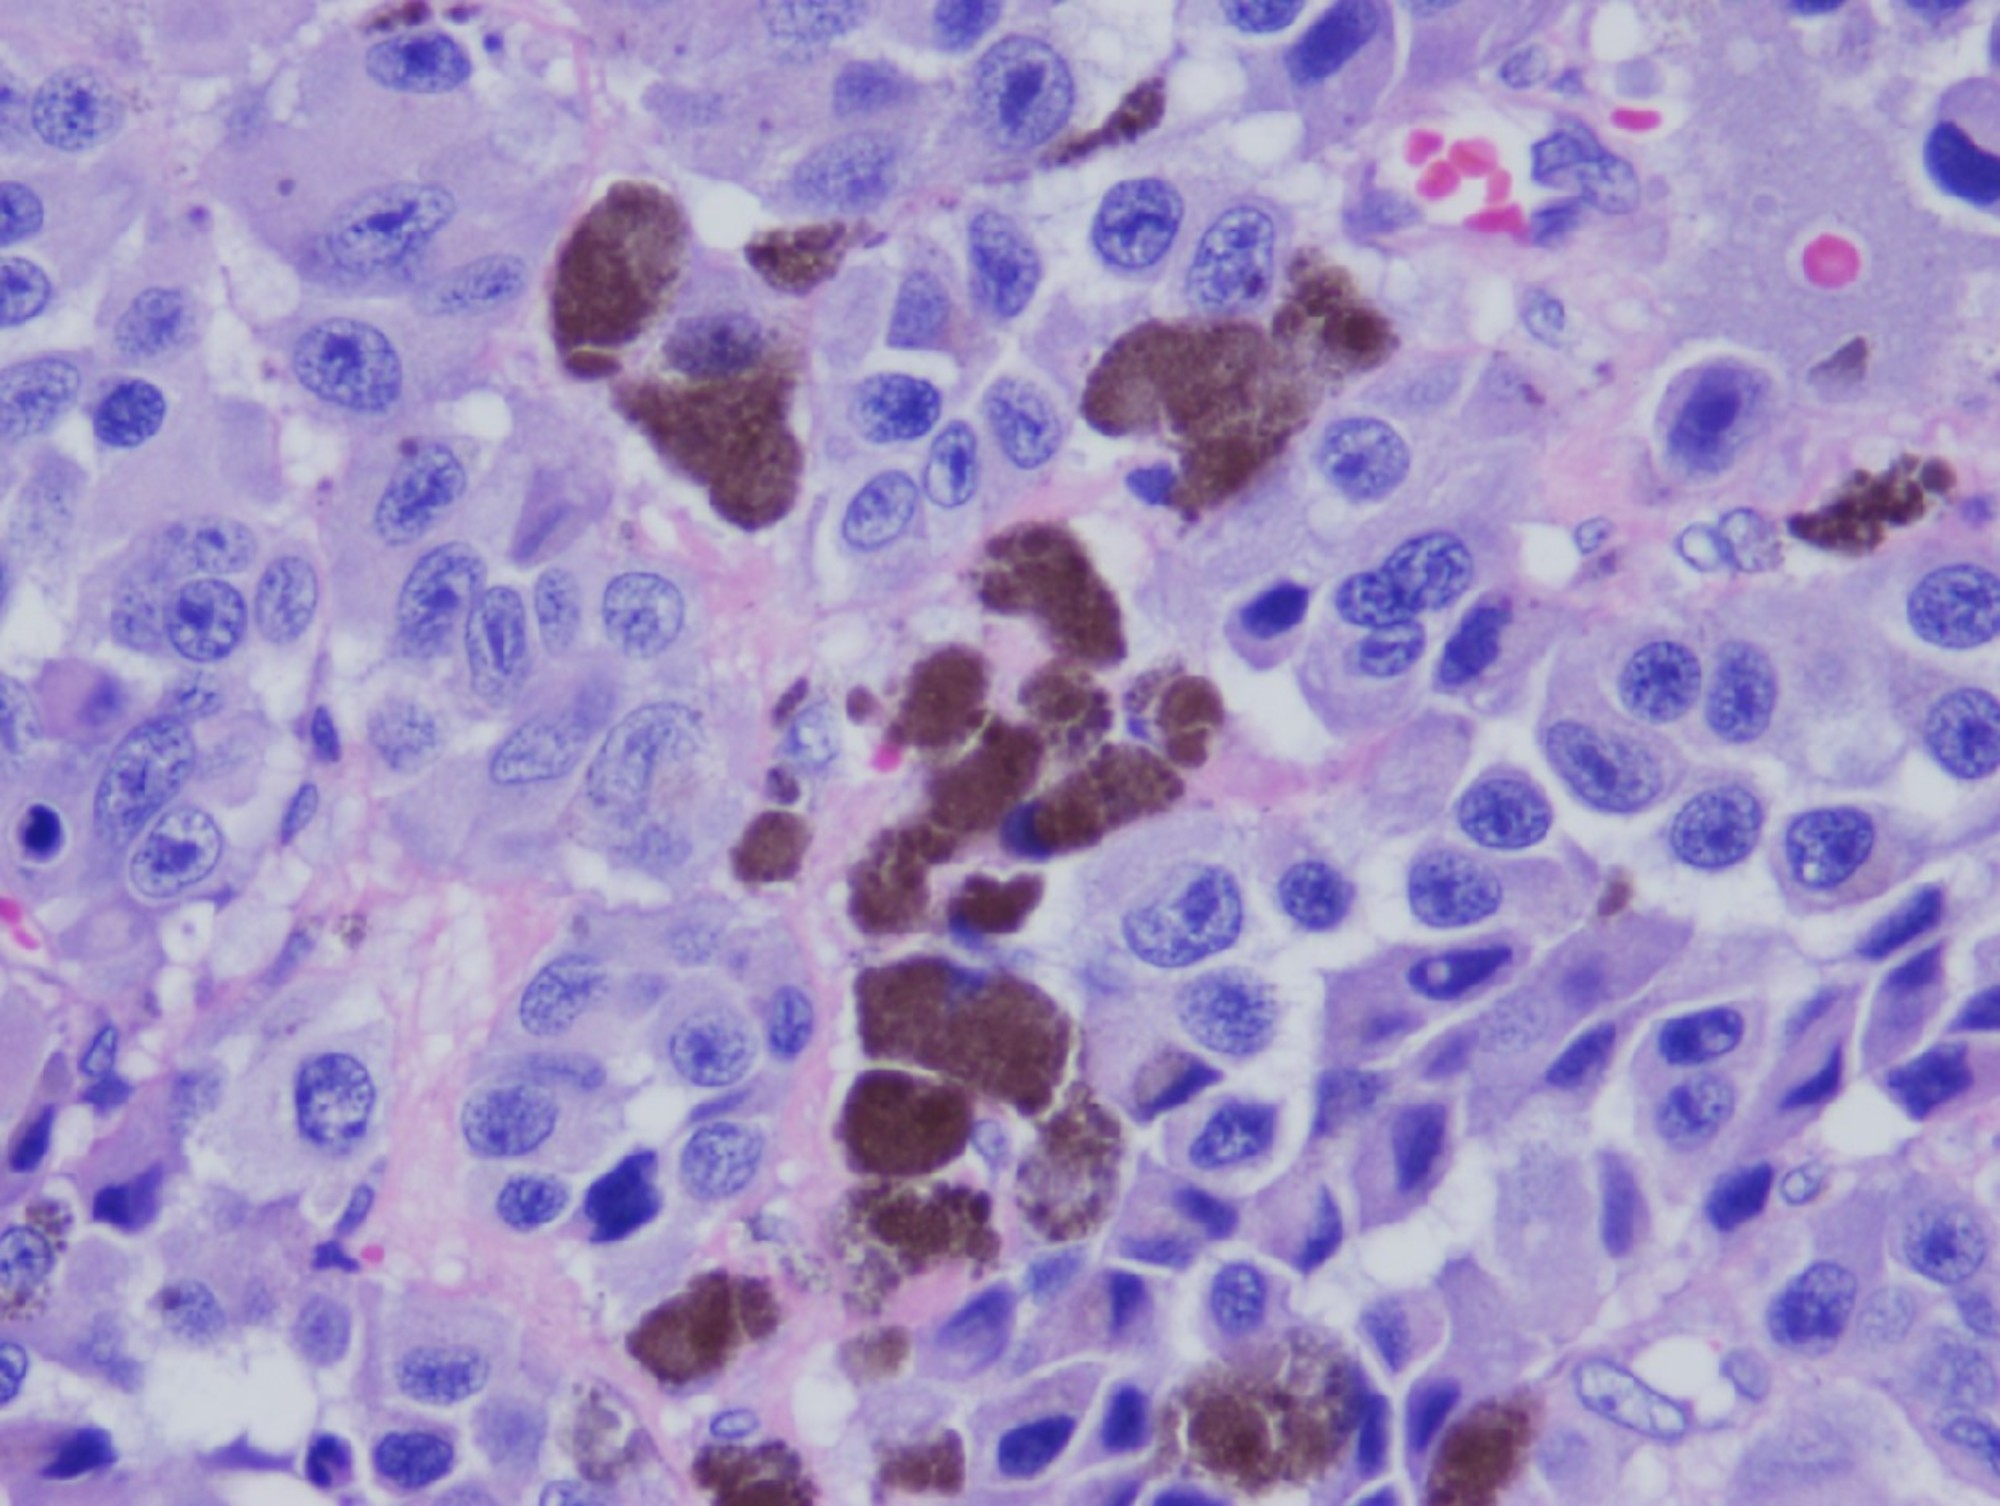 Cureus Isolated Asymptomatic Metastatic Melanoma To The Colon A Case Report